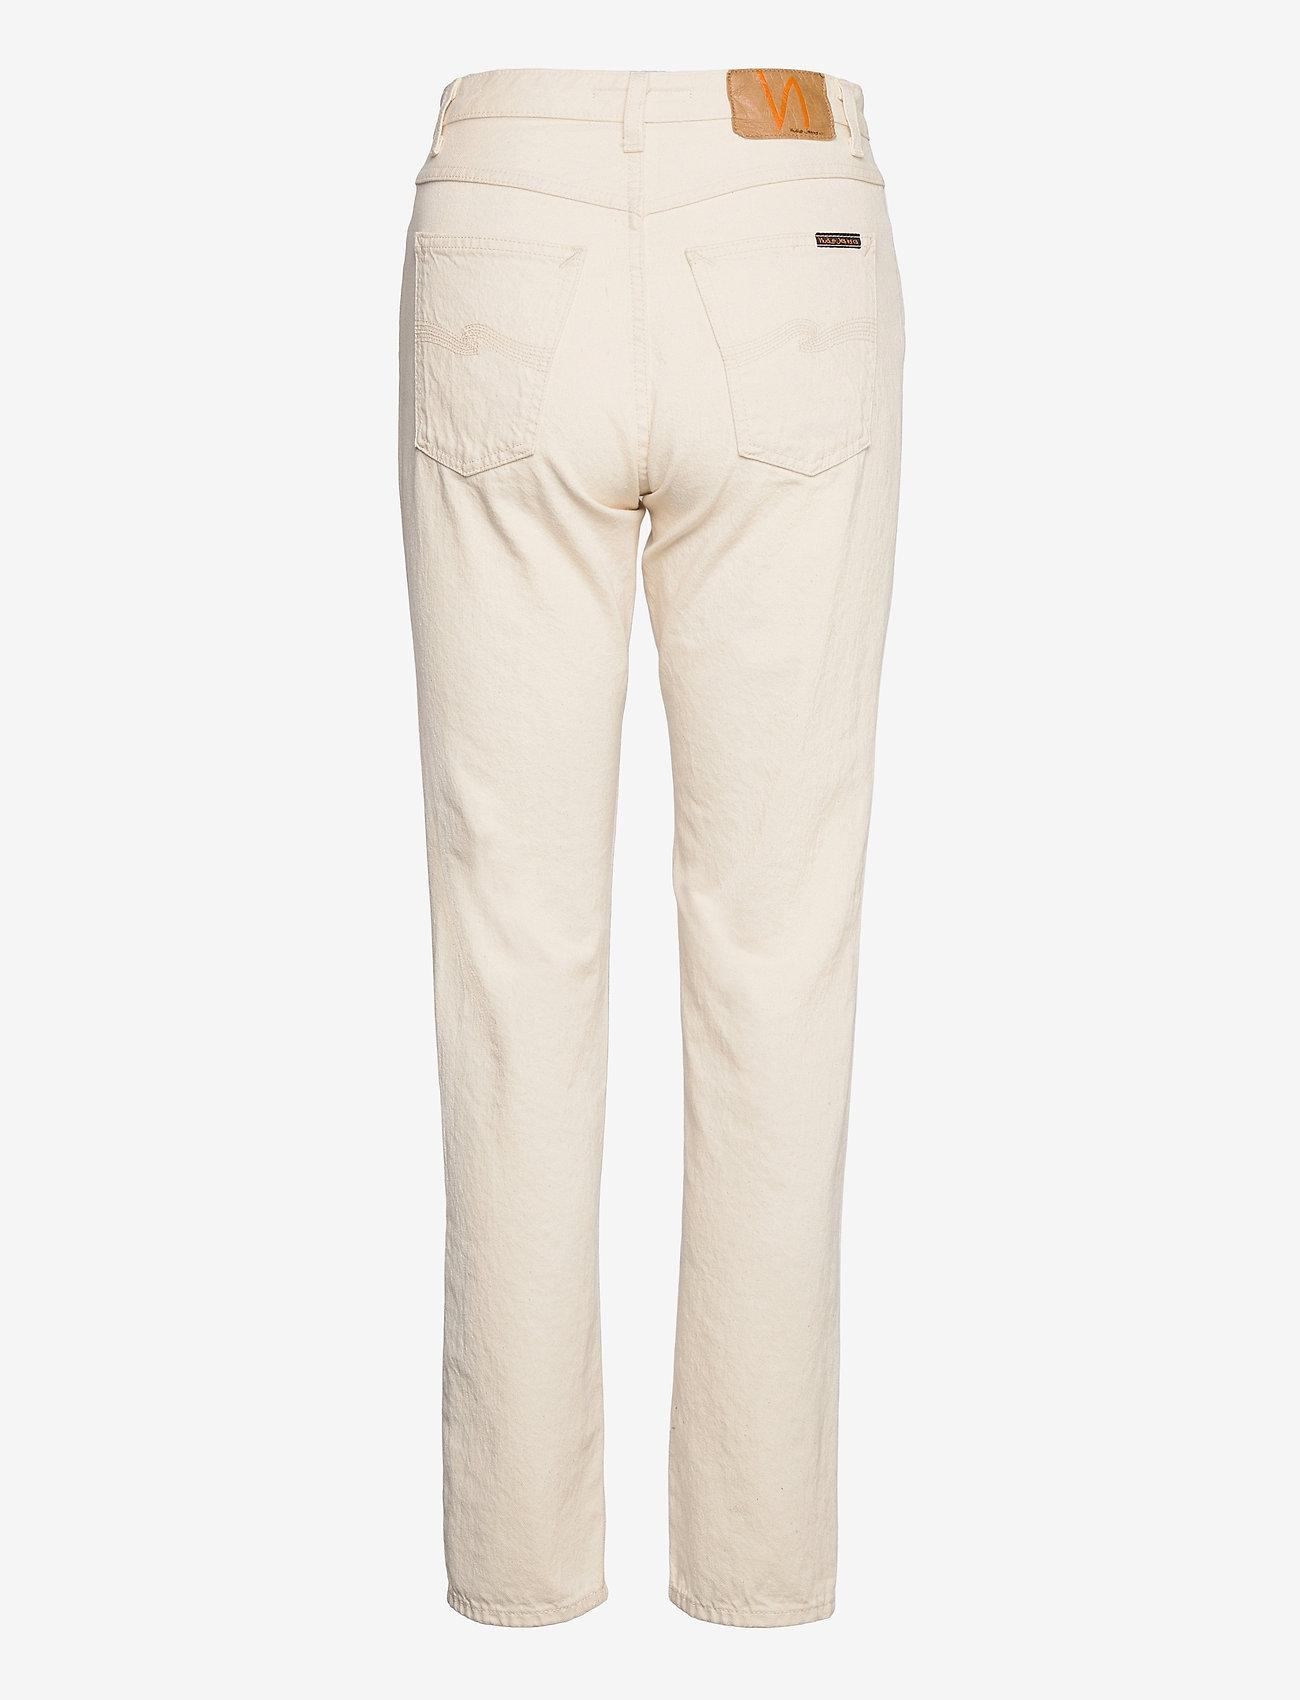 Nudie Jeans - Breezy Britt - straight regular - dusty white - 2